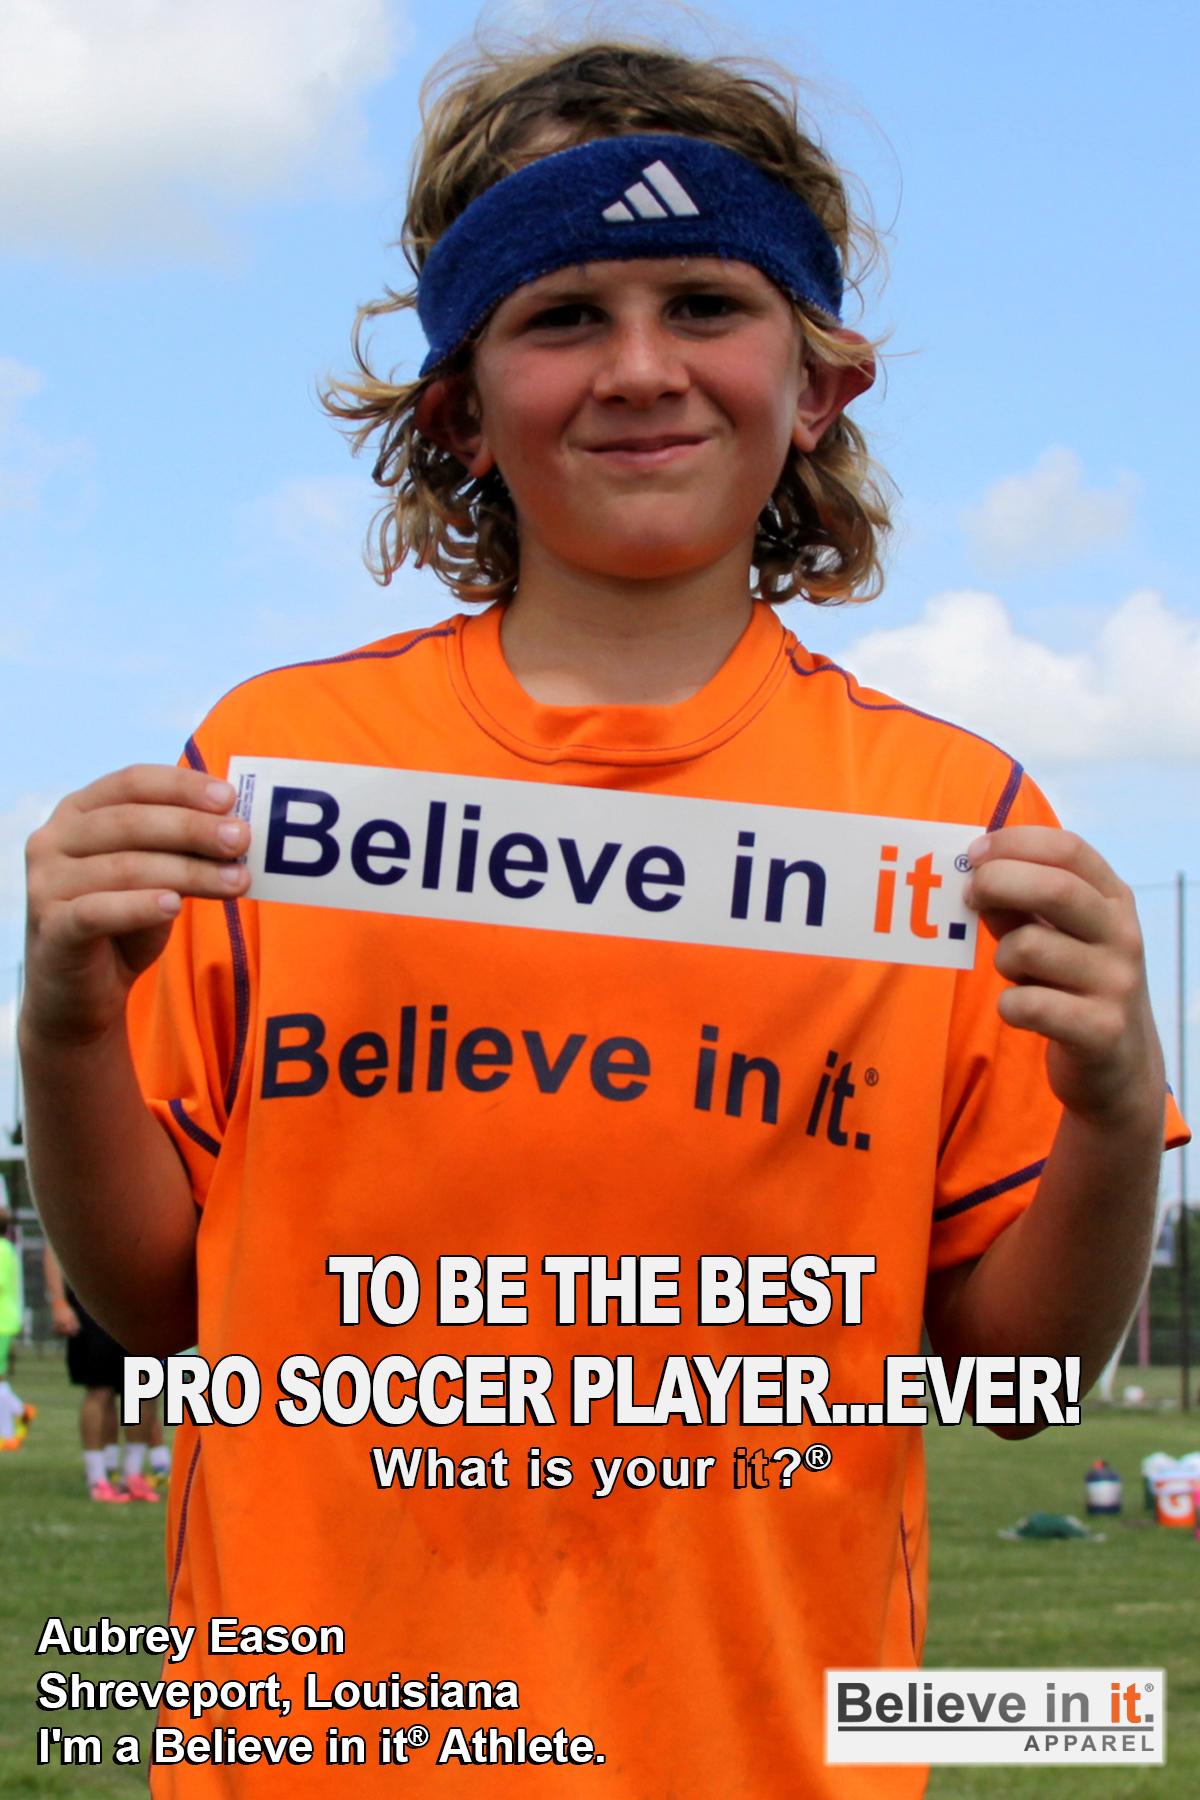 Aubrey Eason Believe in it Athlete